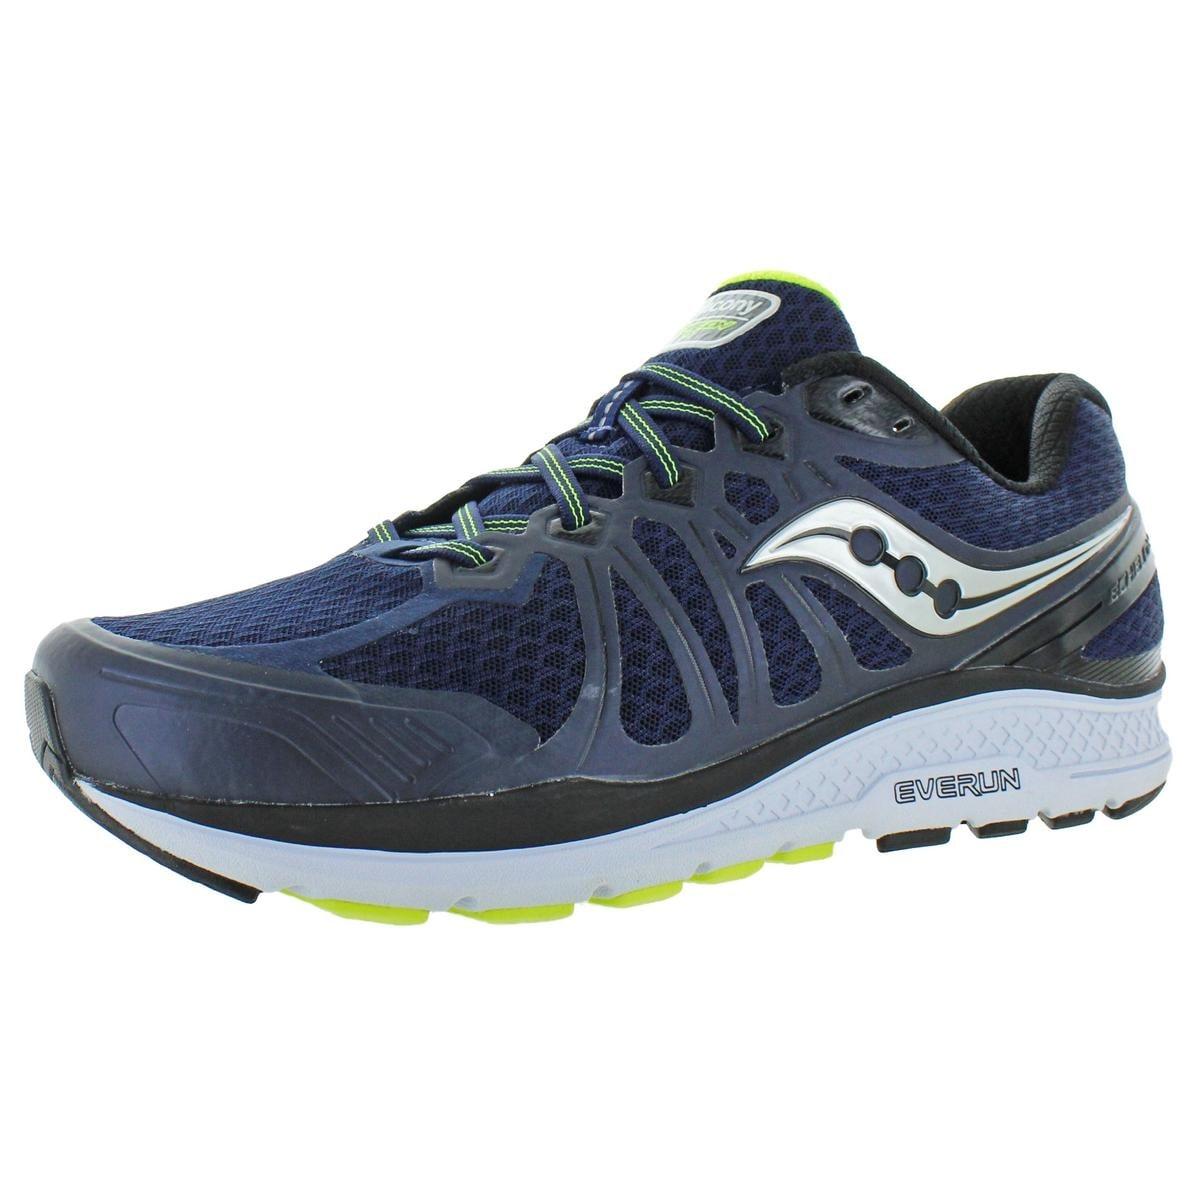 53867c9624 Saucony Mens Echelon 6 Running Shoes Athletic Everun